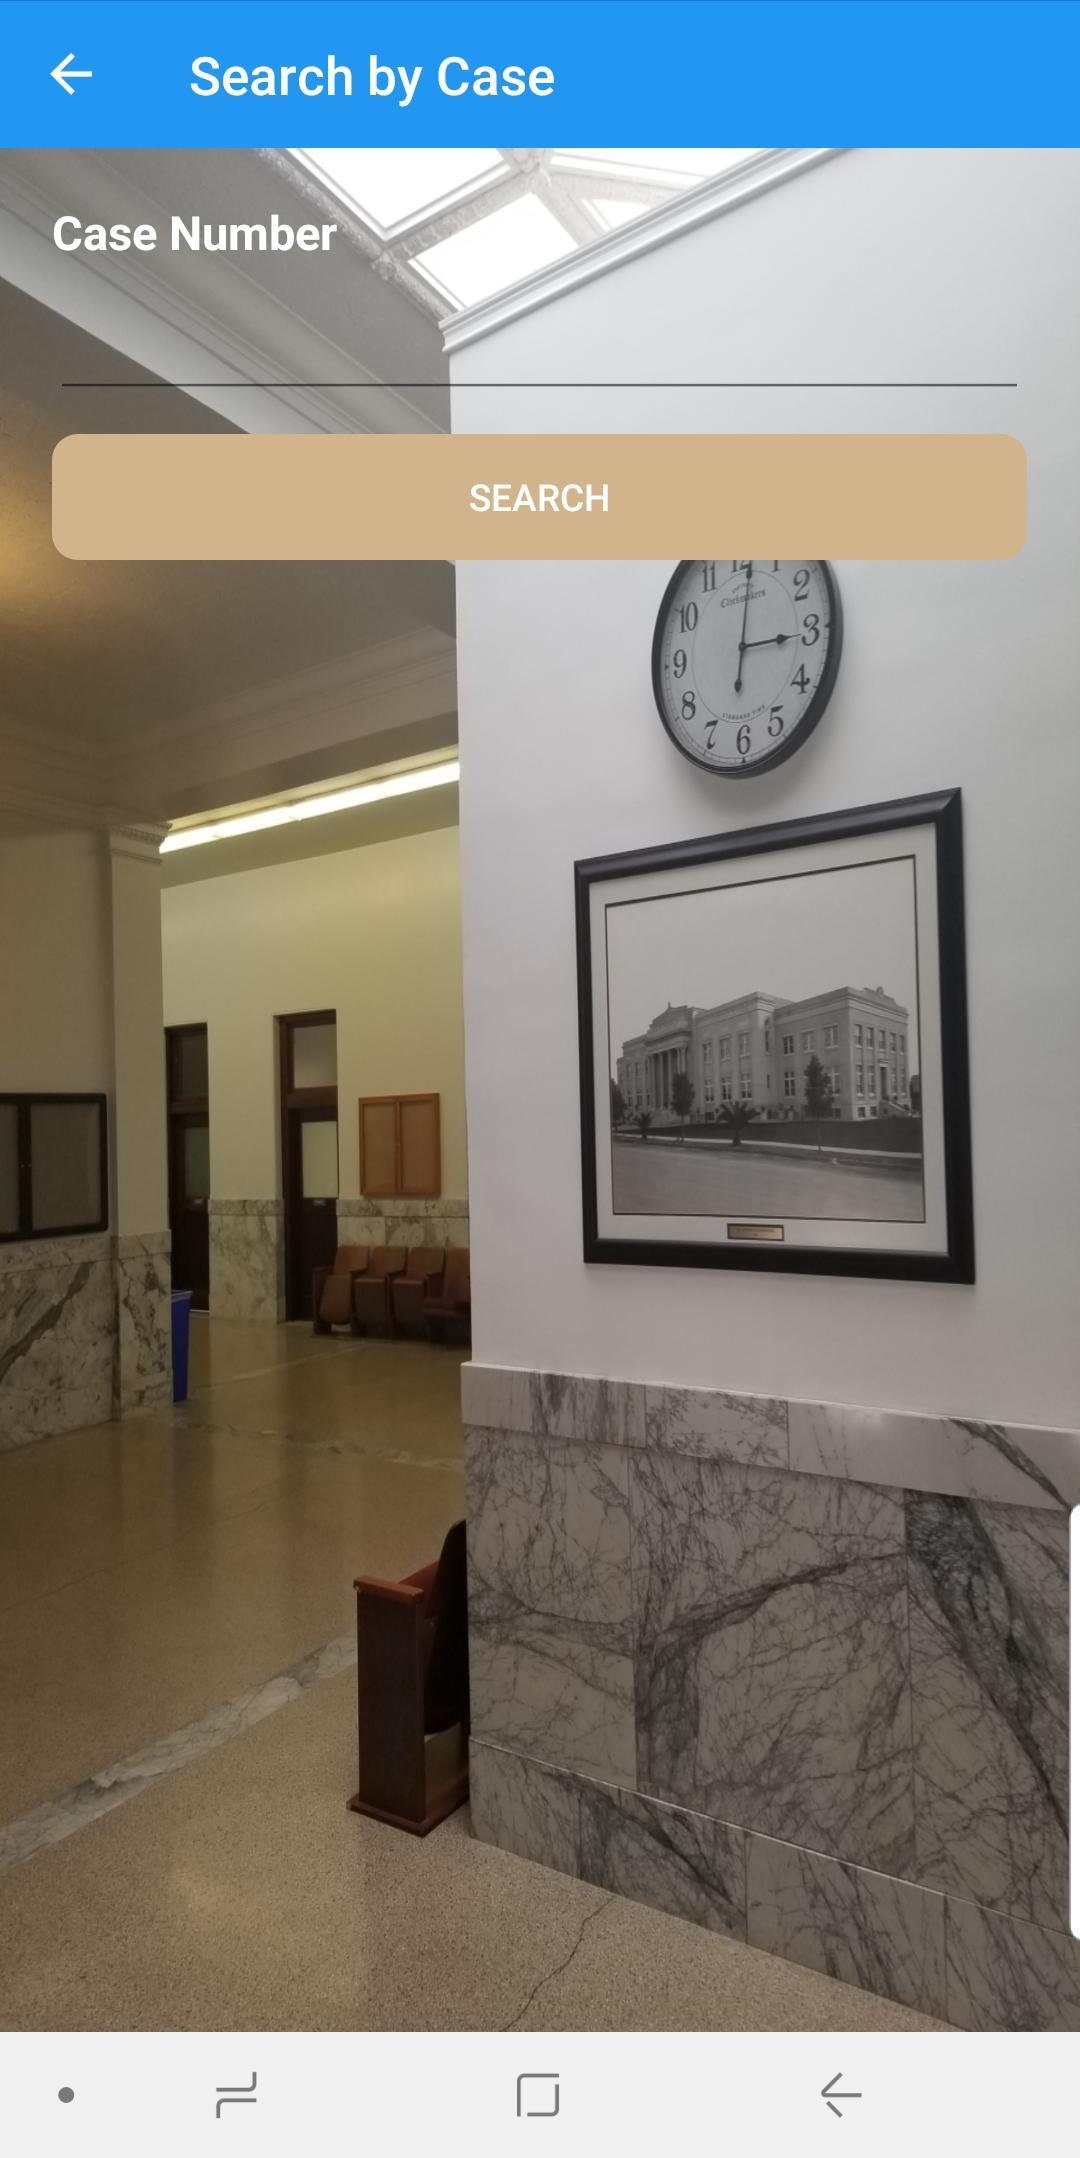 Superior Court Of Ca Imperial Для Андроид - Скачать Apk Regarding Impeiral County Superior Court Calendar